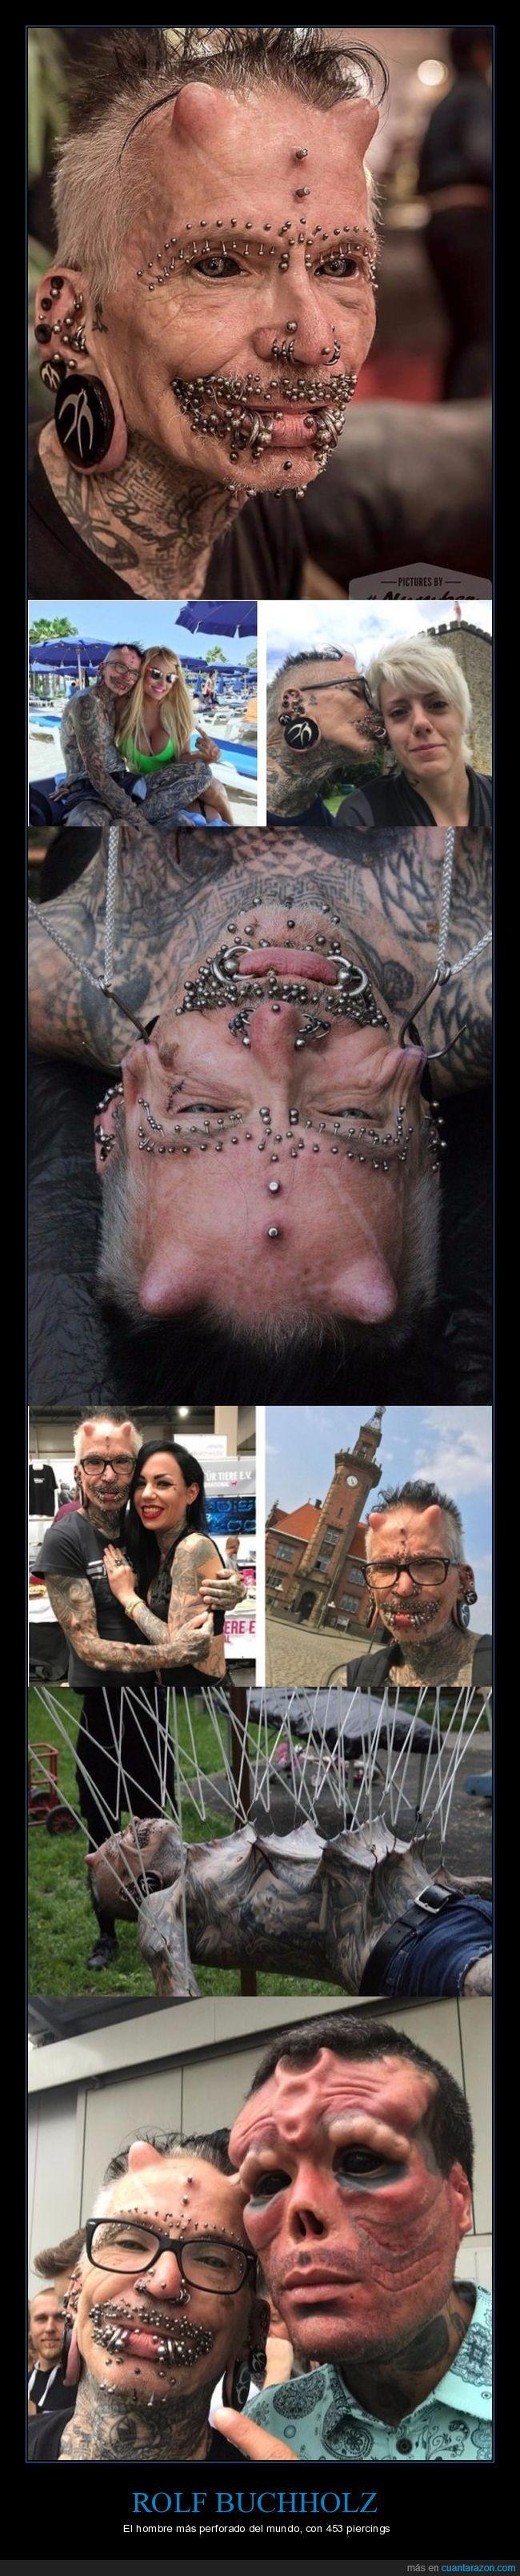 piercings,rolf buchholz